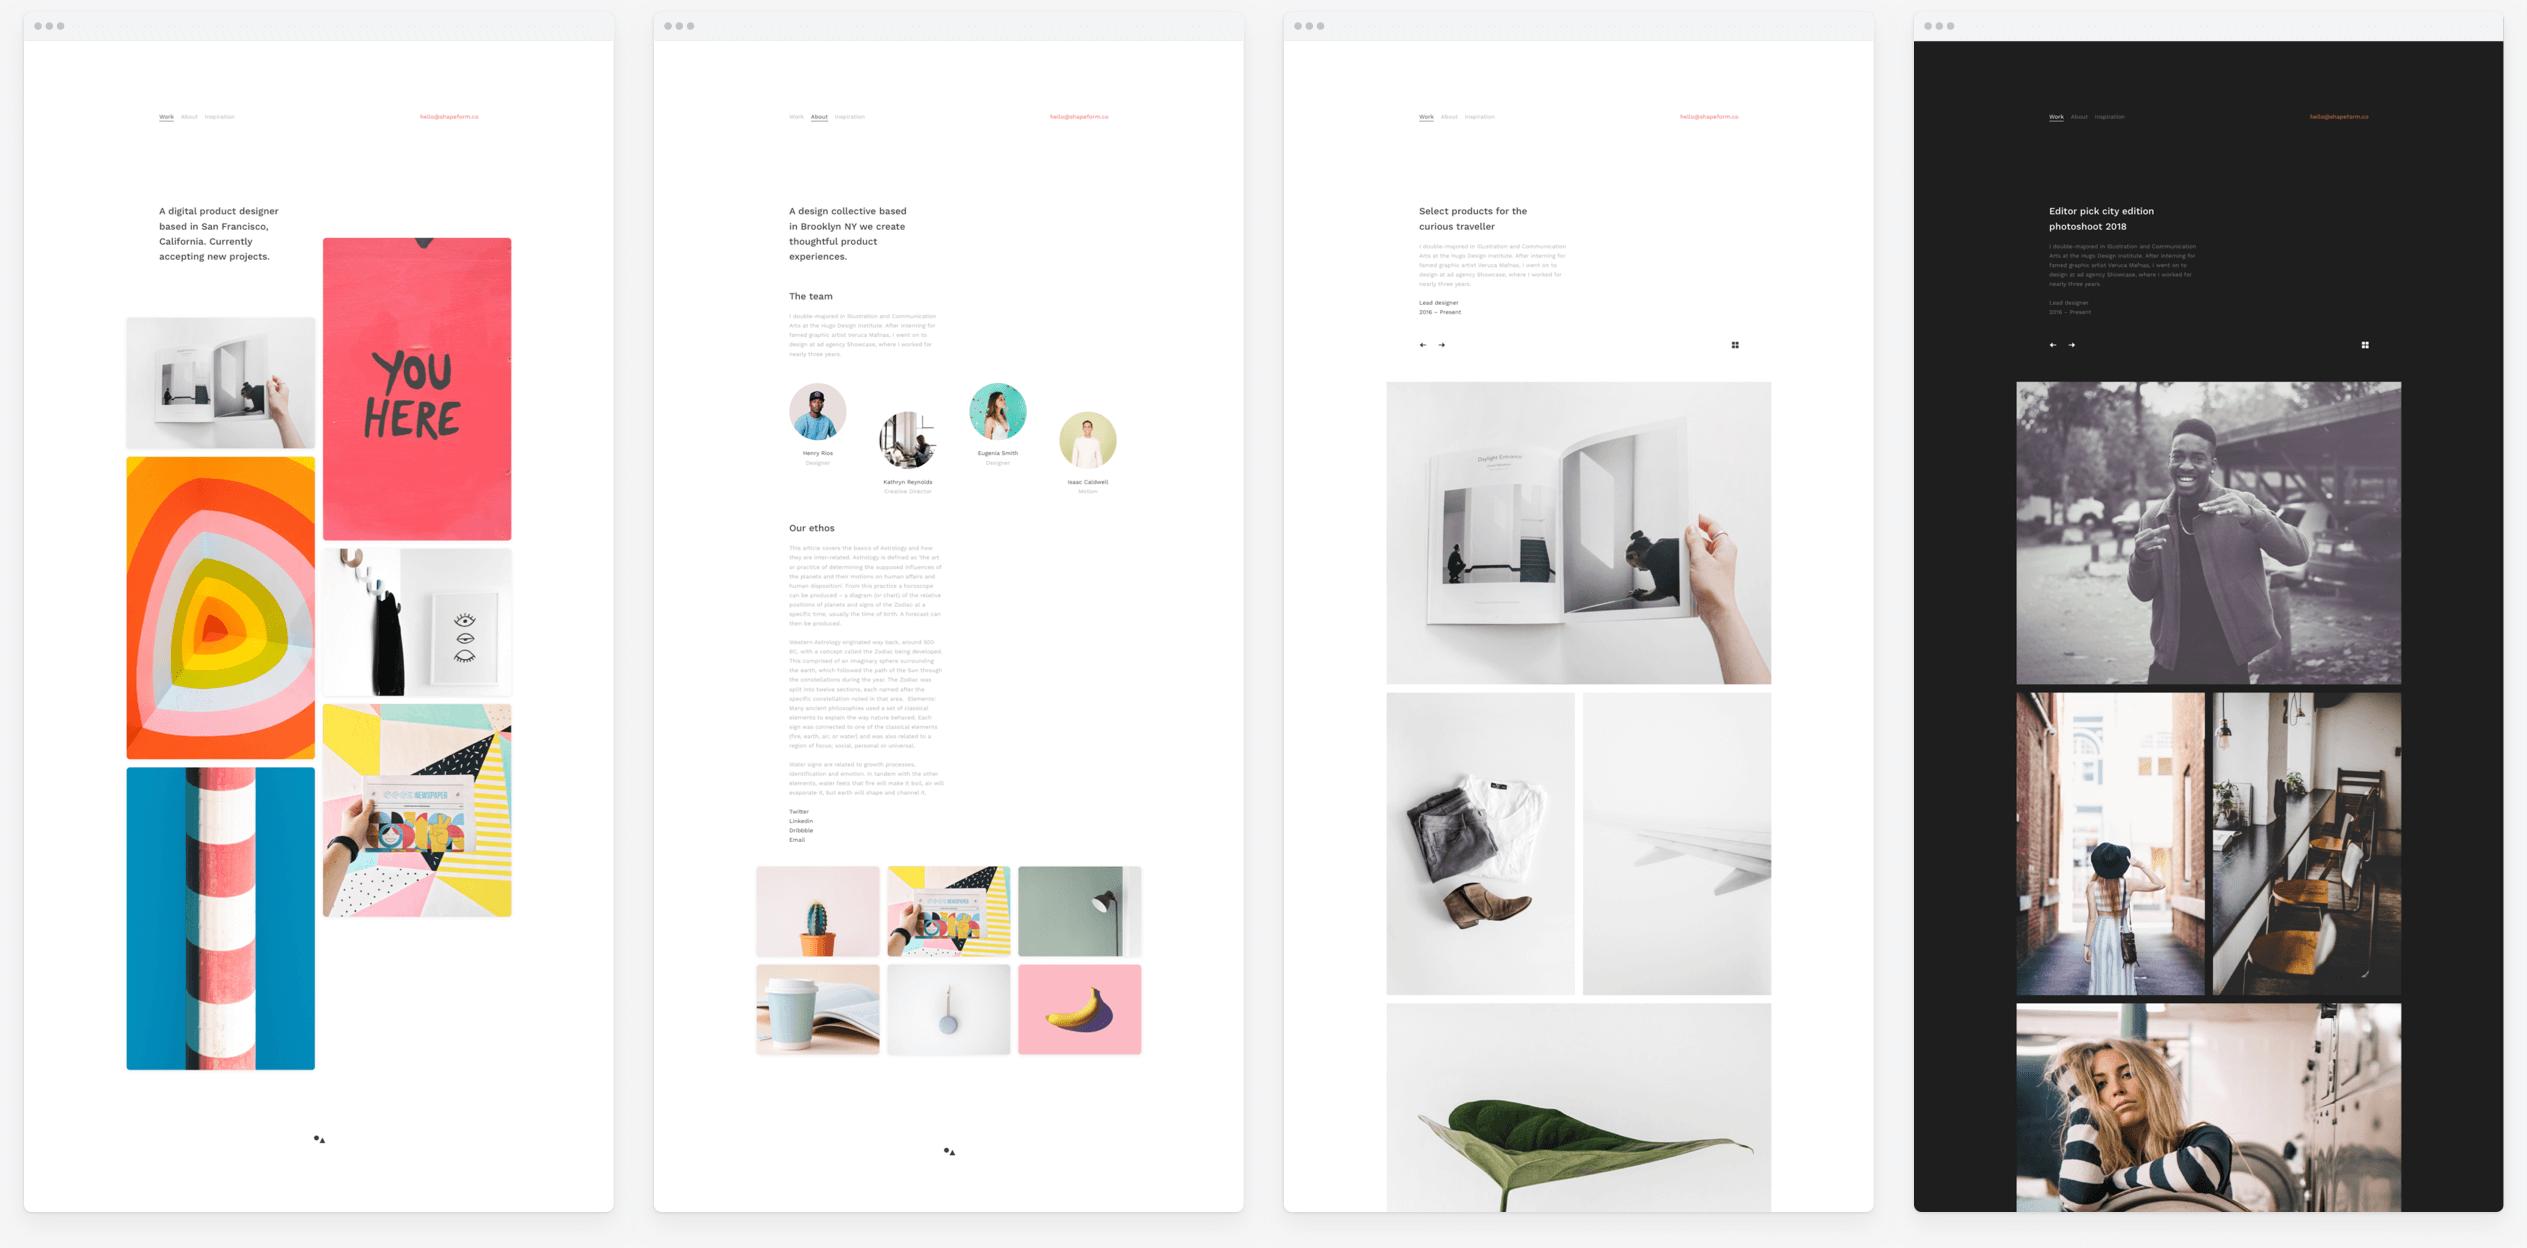 Web screenshot of Shapeform portfolio theme